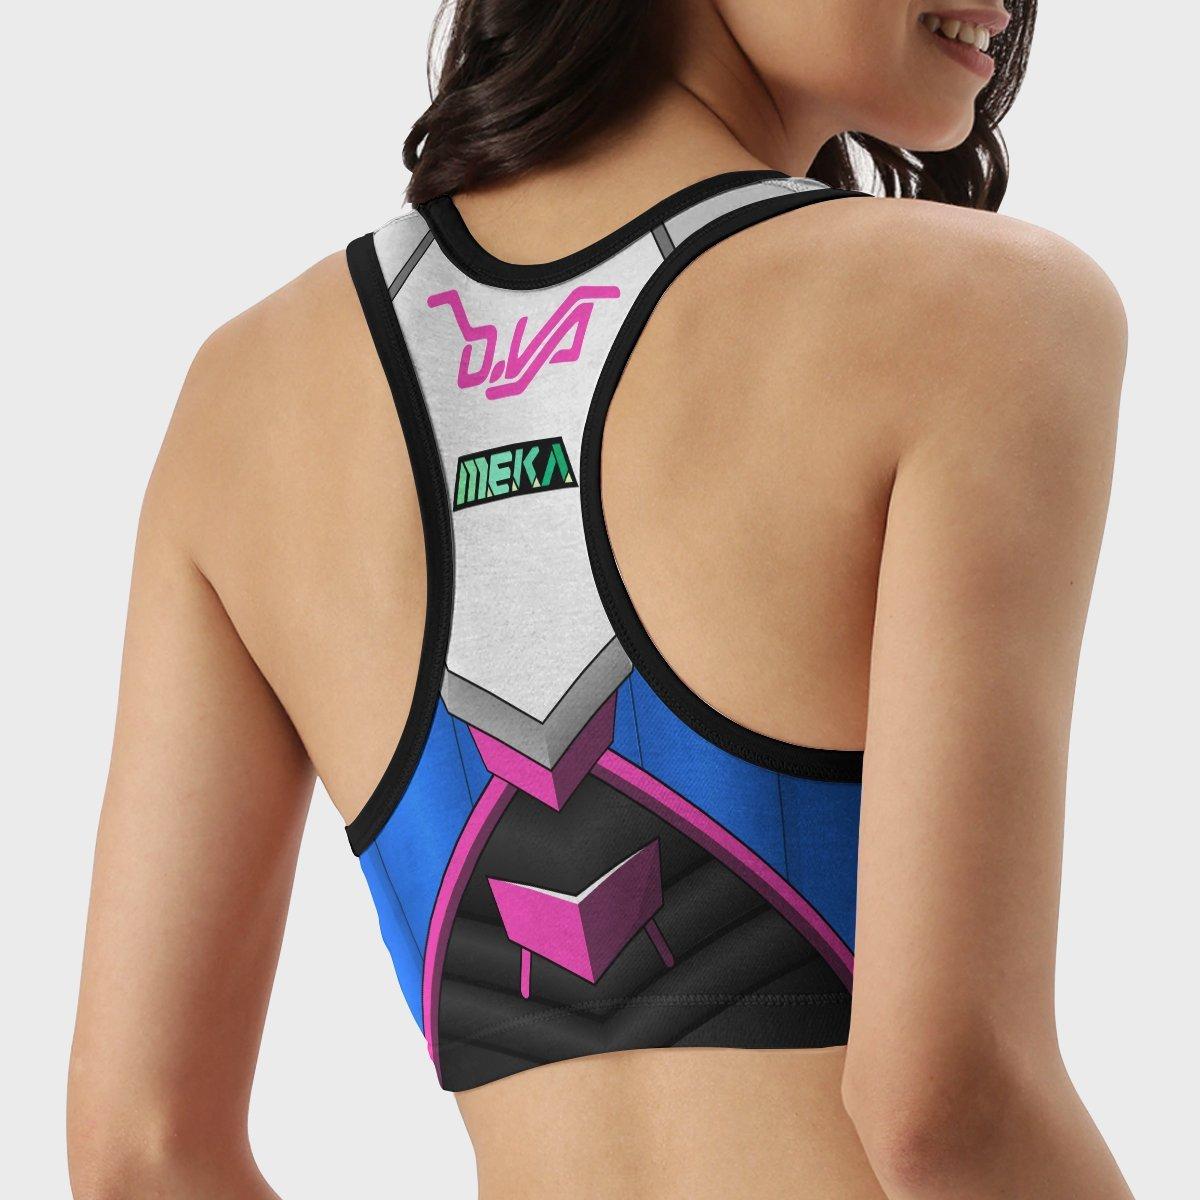 dva summer active wear set 461720 - Anime Swimsuits